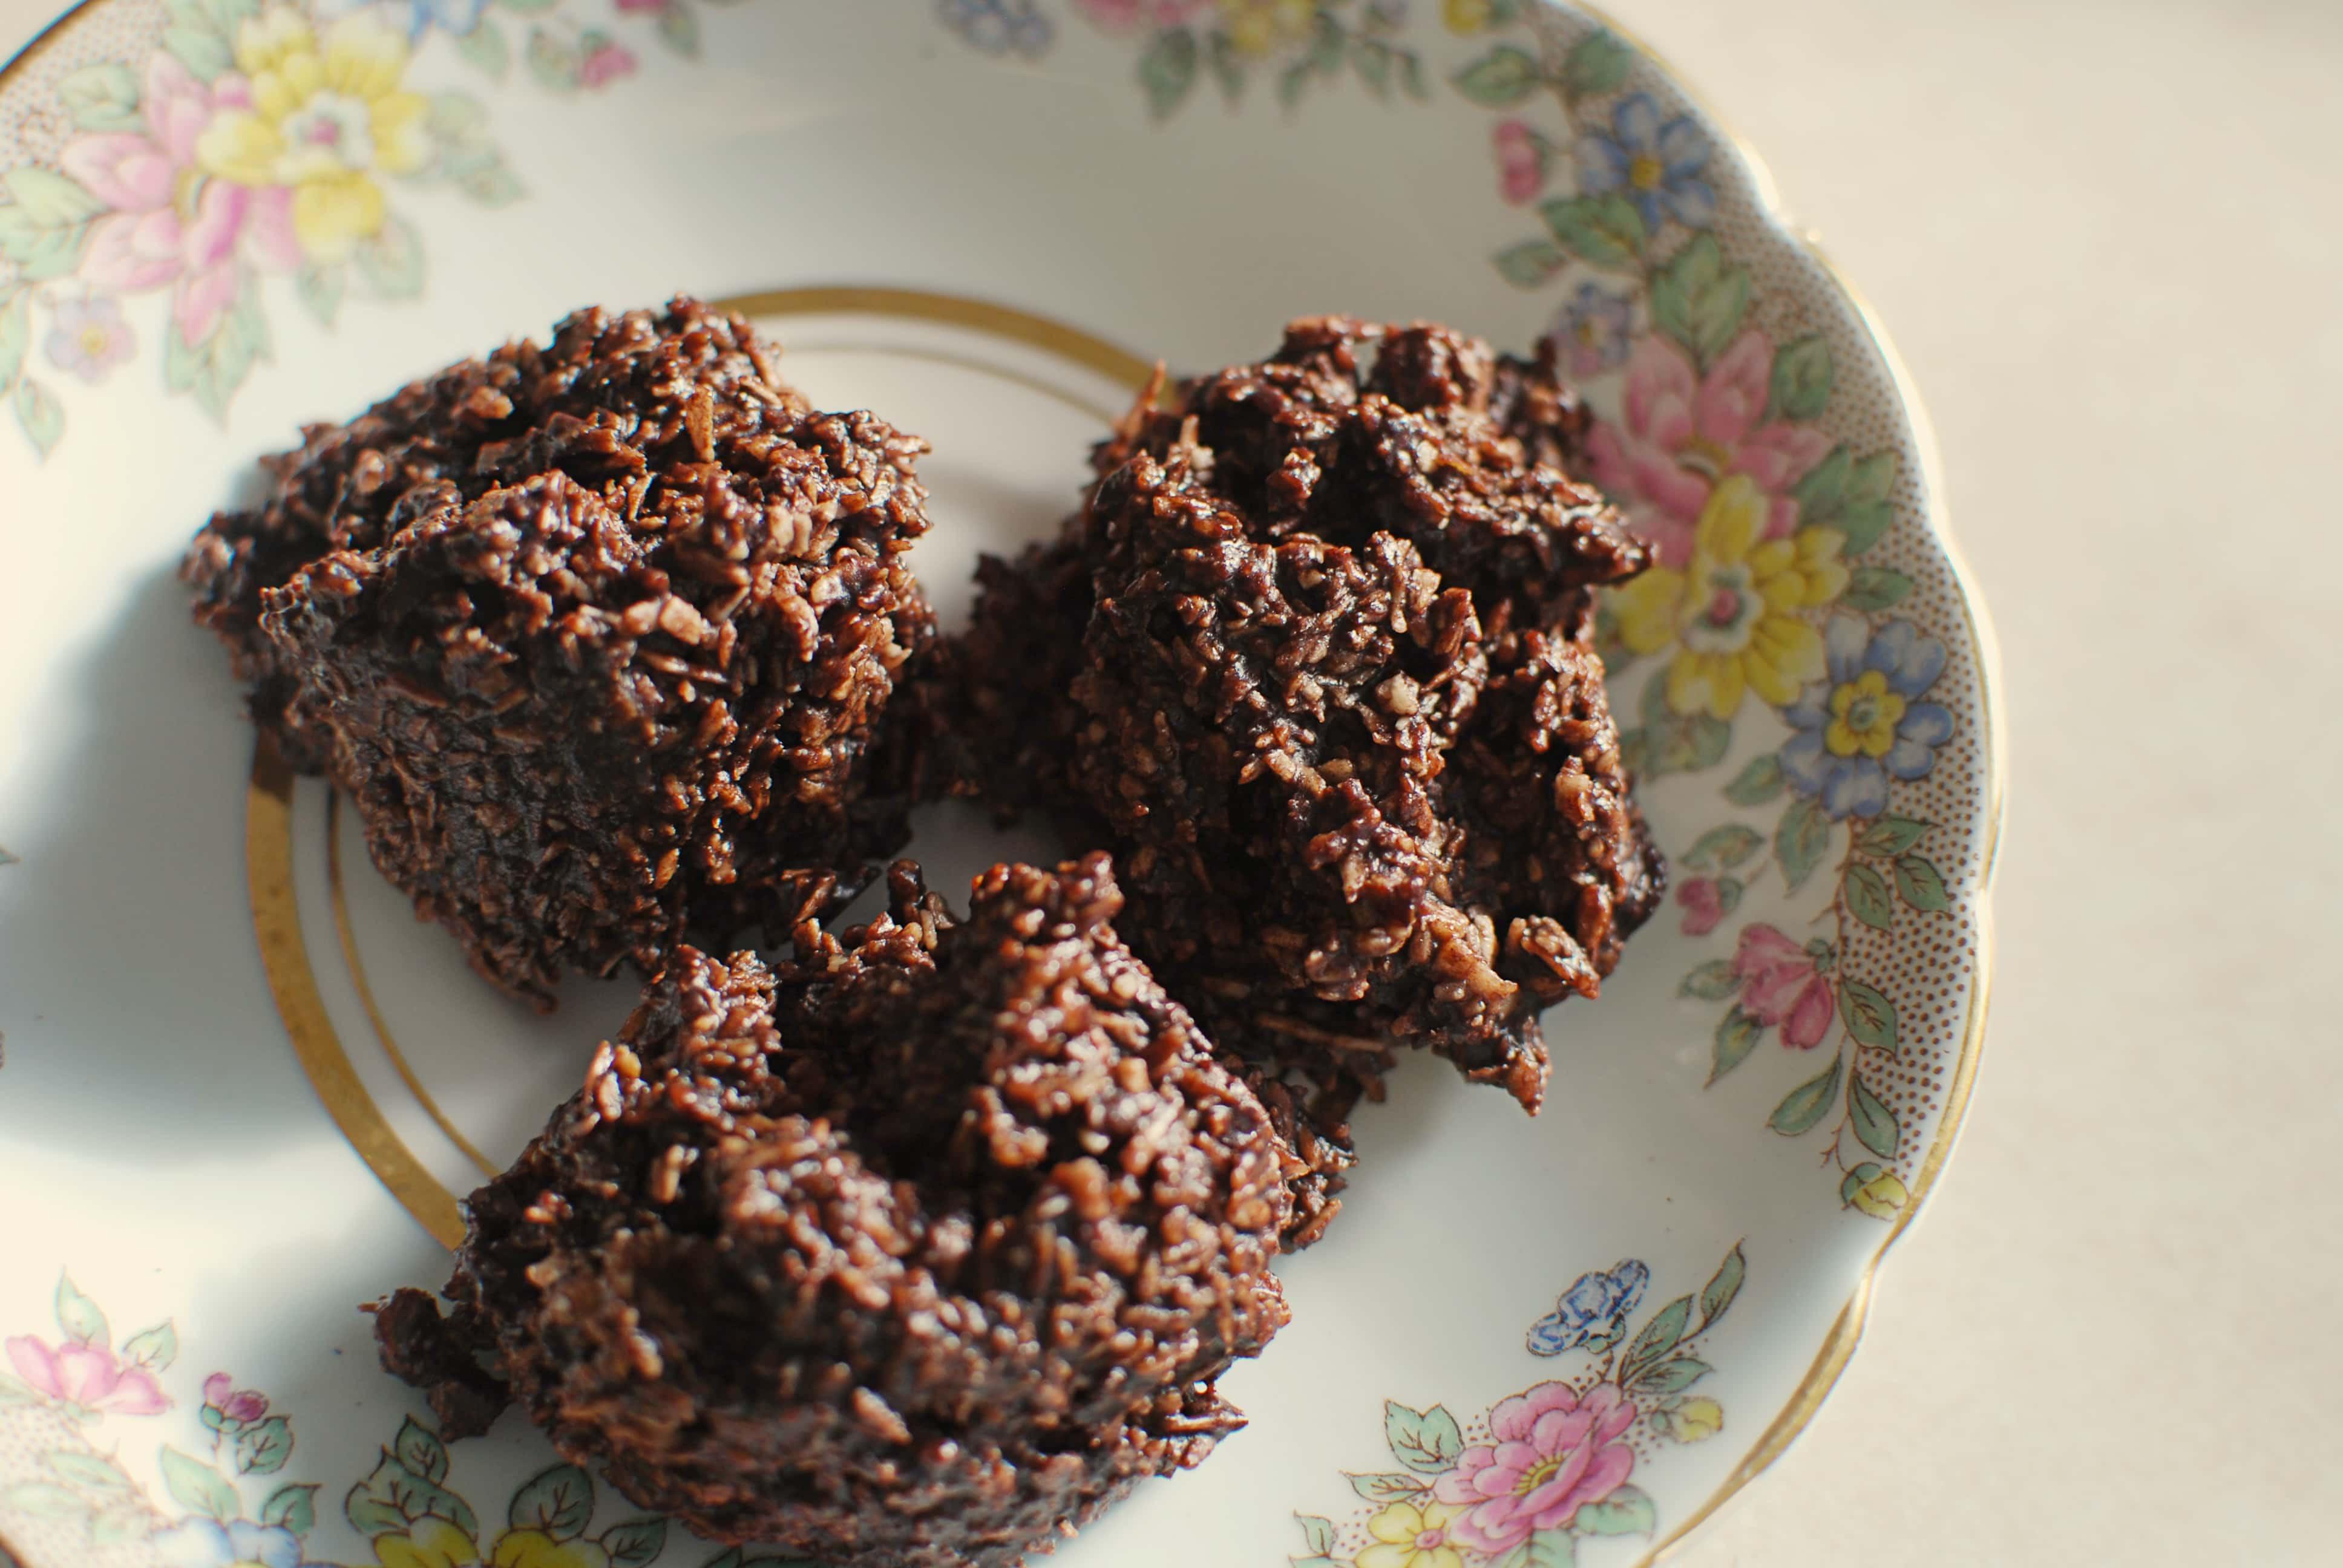 Chocolate Coconut Macaroons  No Bake Chocolate Coconut Macaroons Grain free Dairy